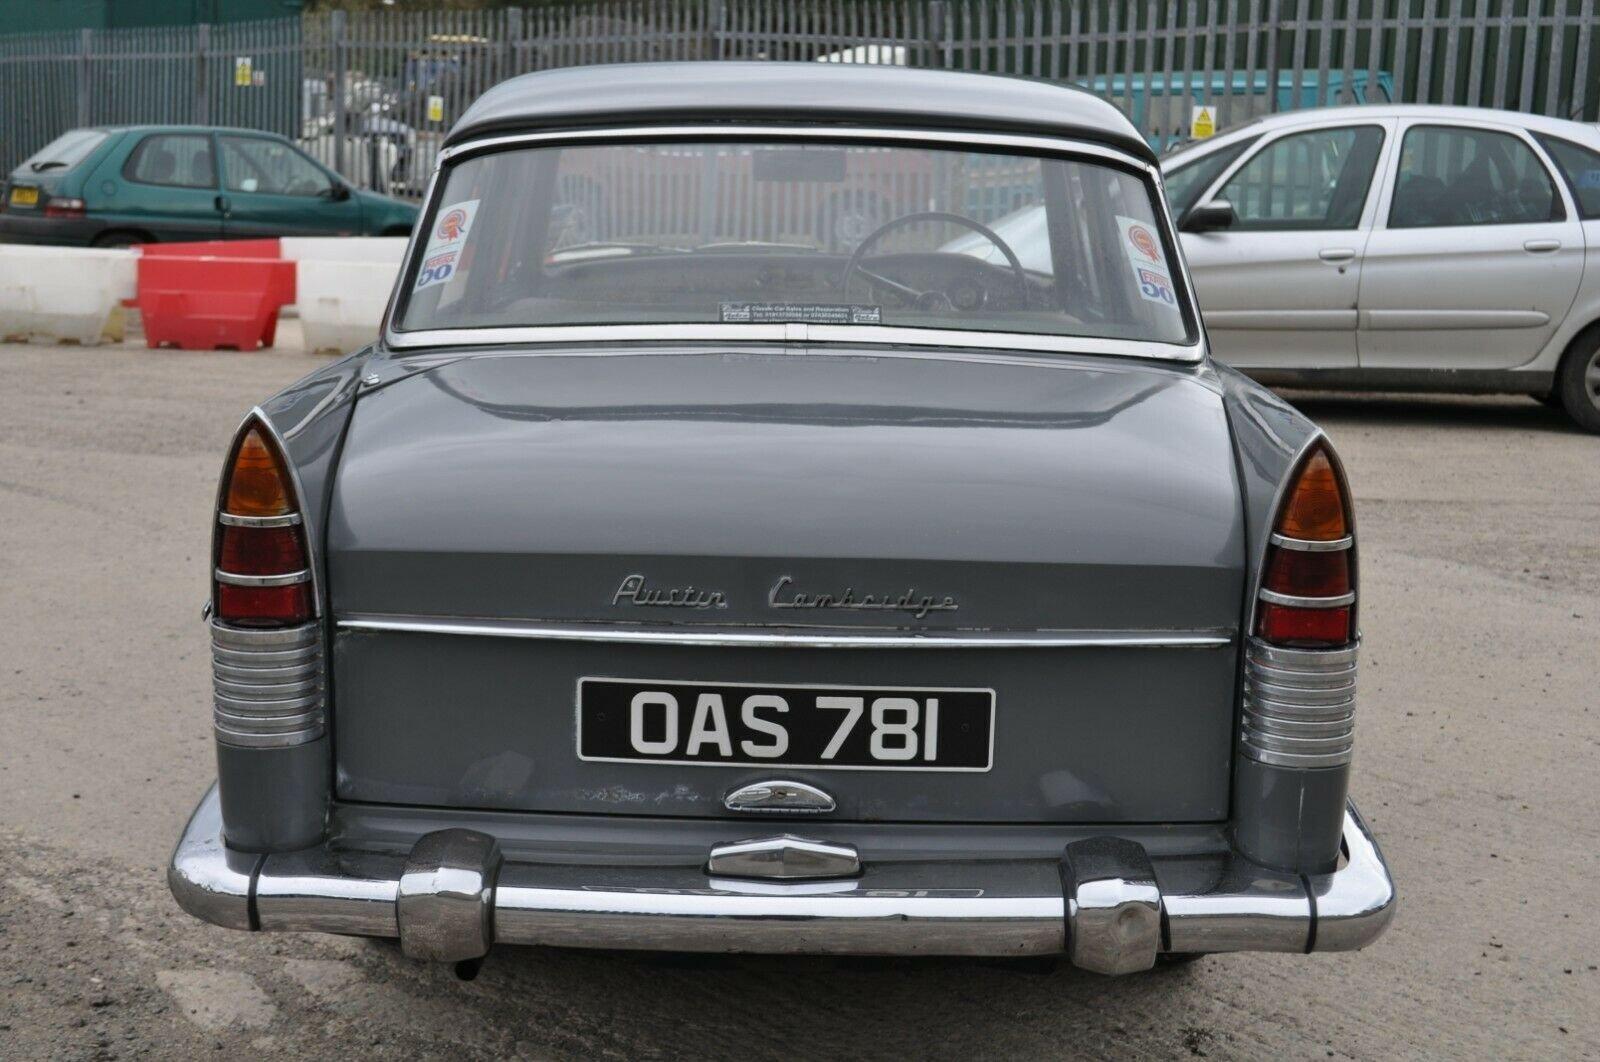 1961 AUSTIN CAMBRIDGE A55 FARINA TAX & MOT EXEMPT GRAMPIAN GREY For Sale (picture 3 of 6)